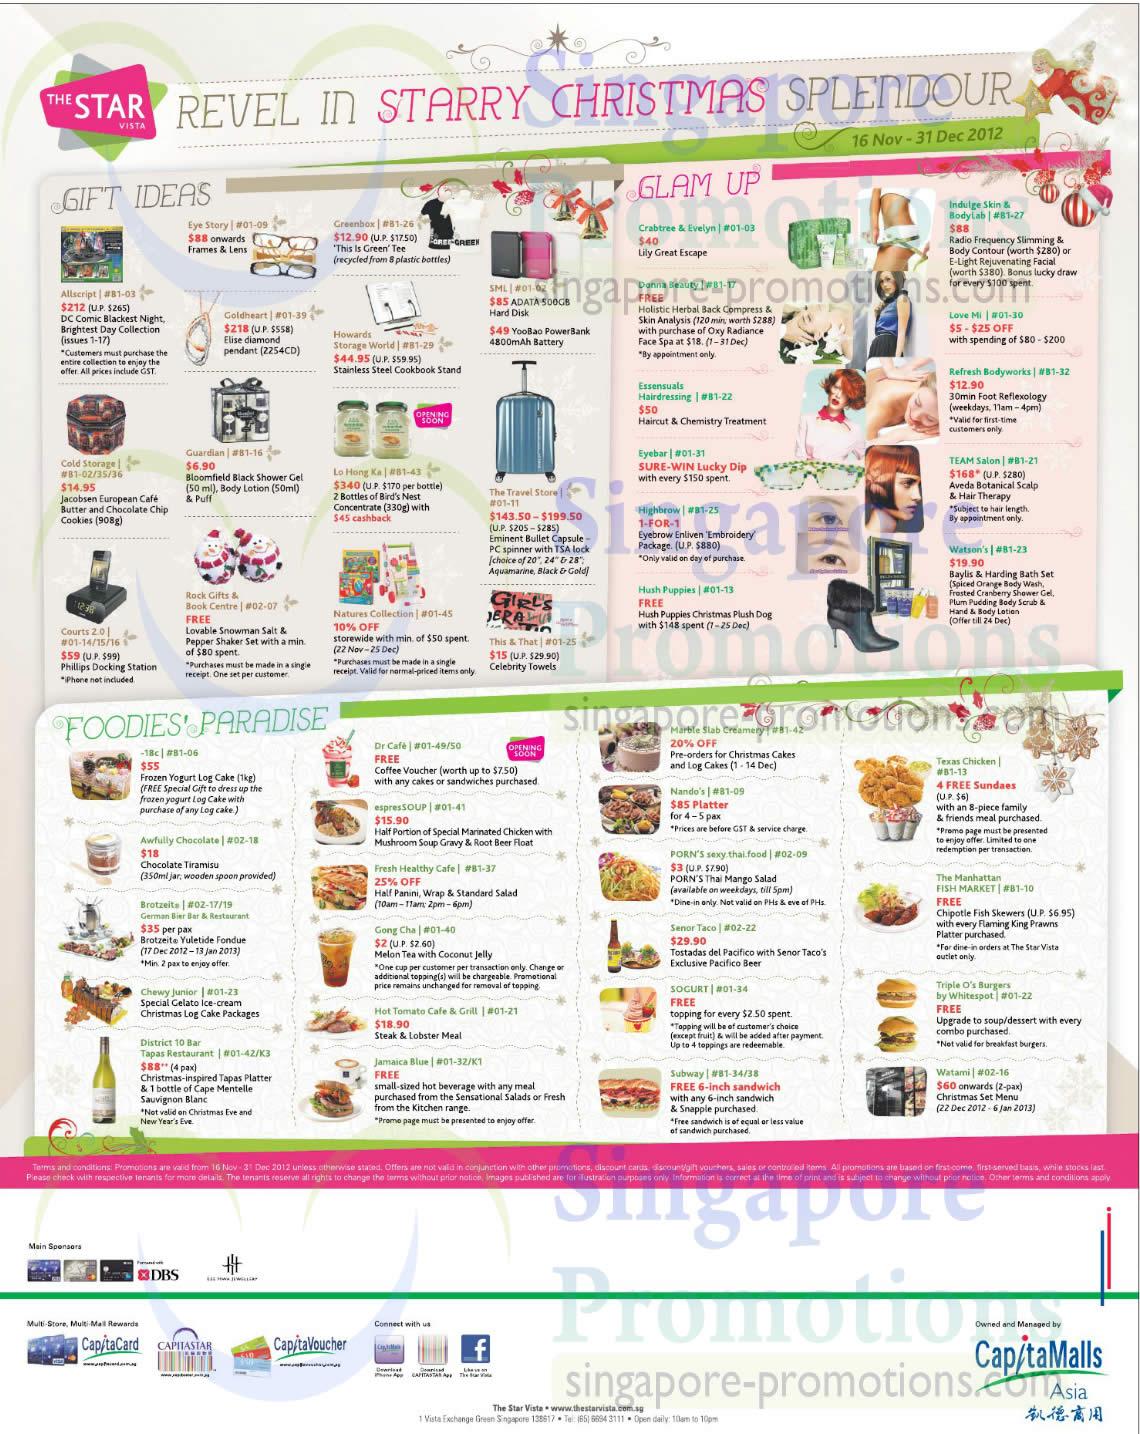 23 Nov Foodies Paradise, Gift Ideas